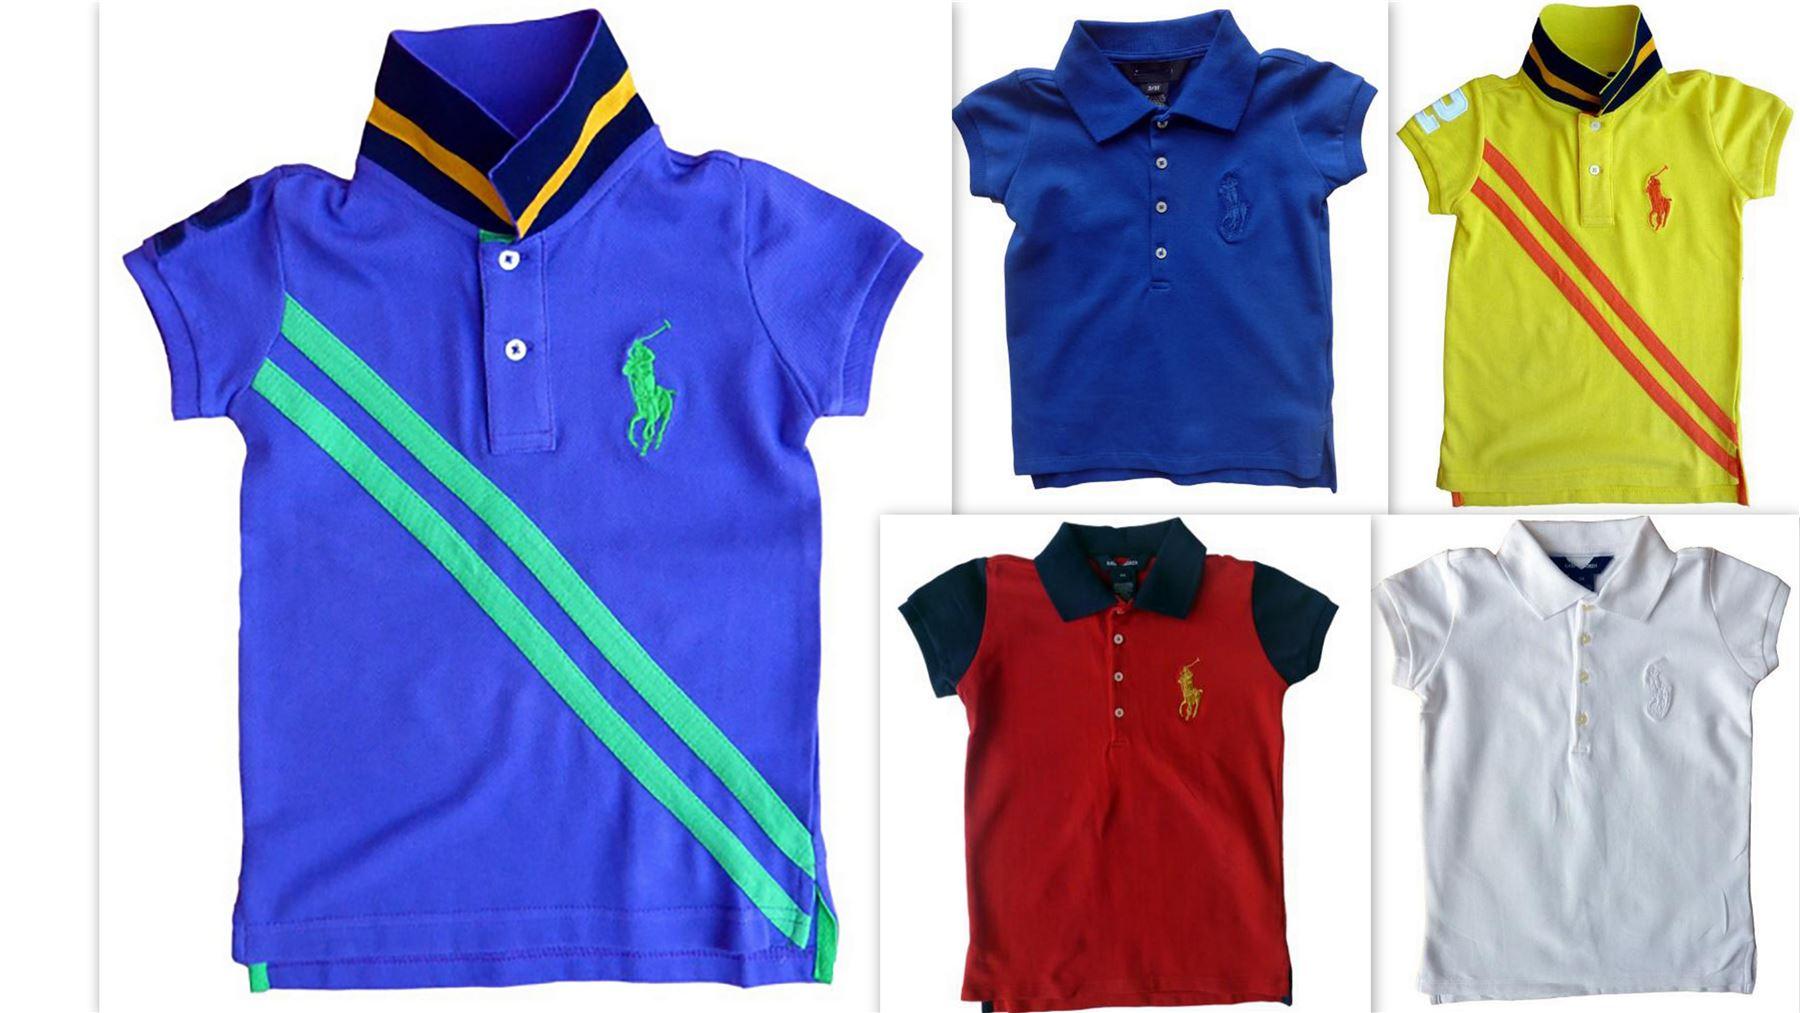 Girls RL Big Pony Short Sleeve Polo T-shirt